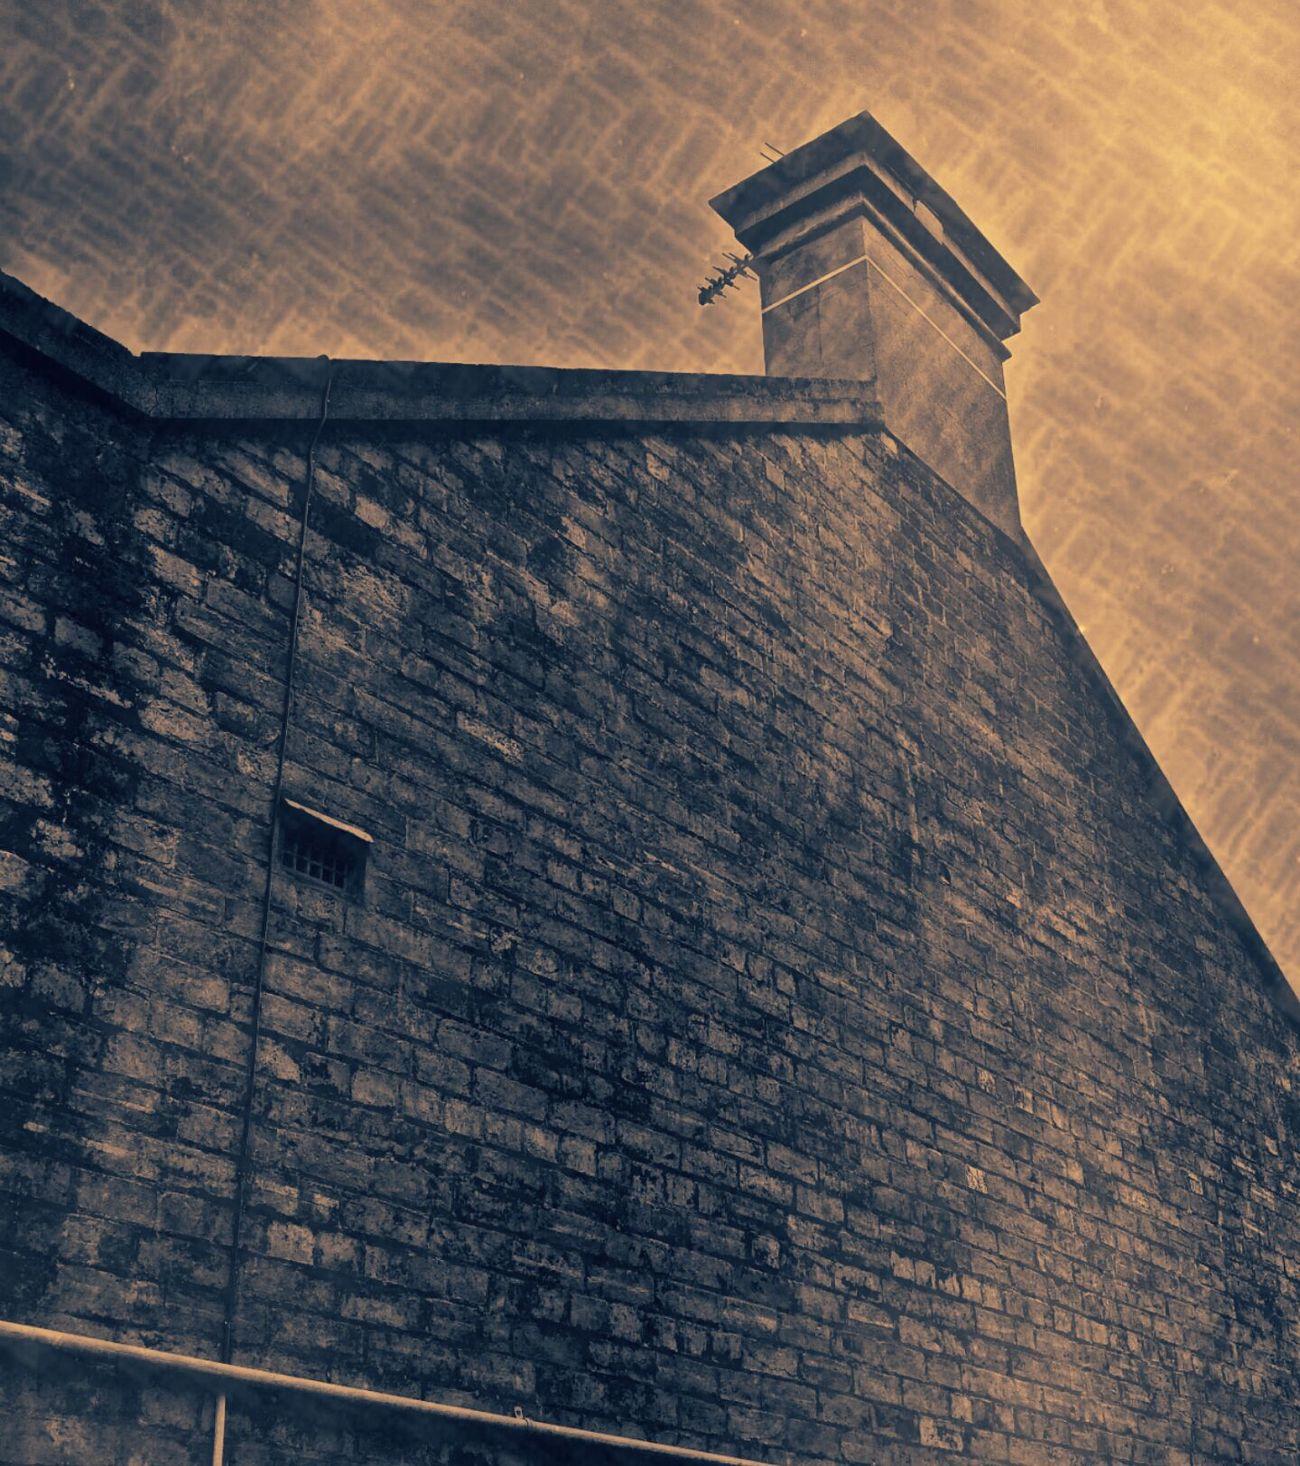 BuildingPorn Brickporn Architecture Carlton Lanewaysofmelbourne EyeEm Best Shots Picoftheday